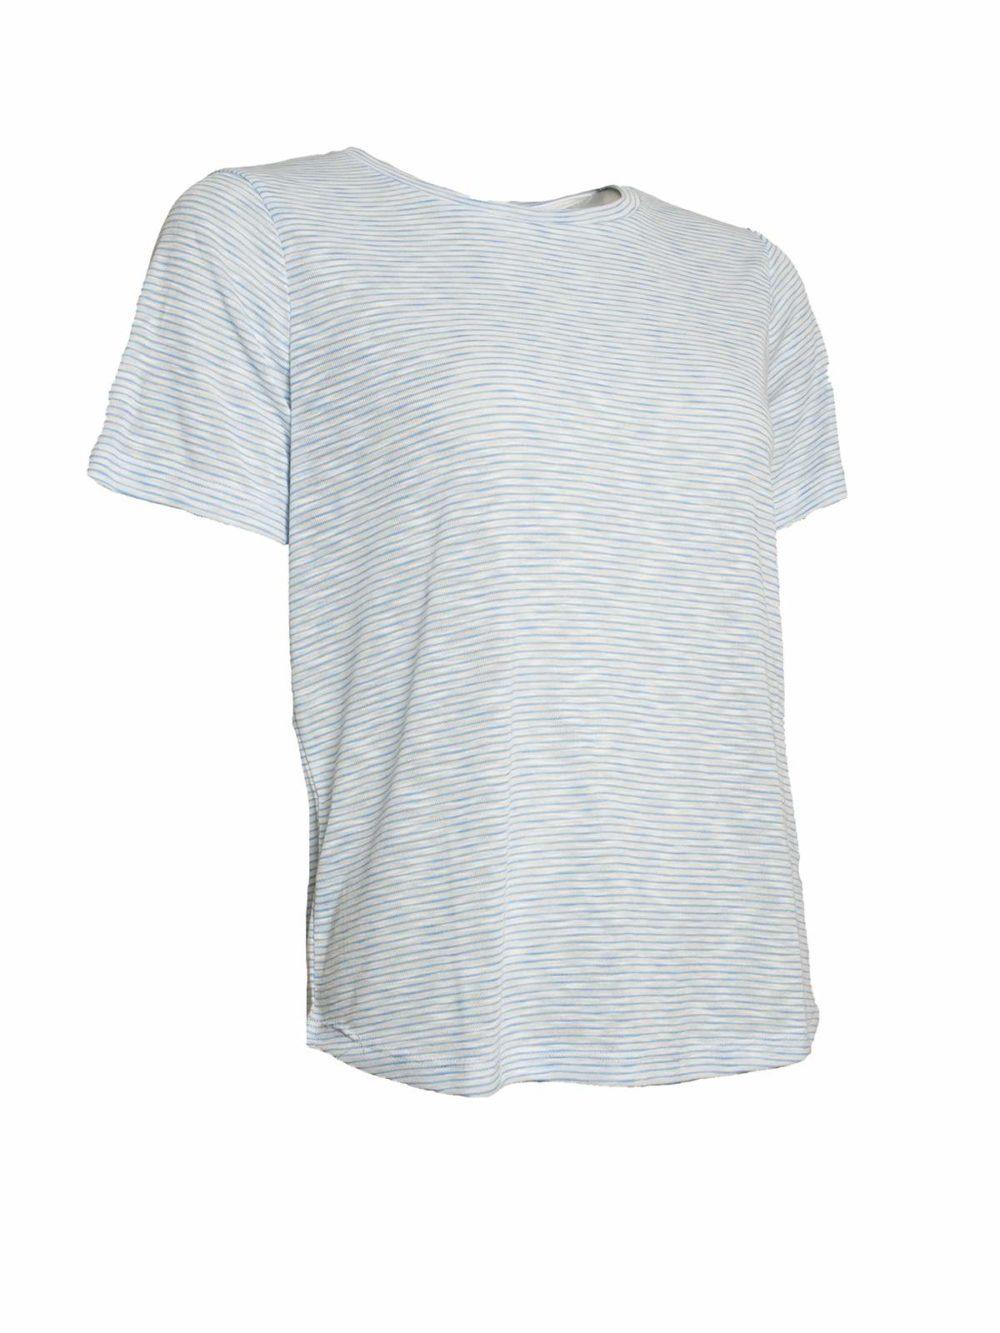 Zebra T-shirt ICHI Katie Kerr Women's Clothing